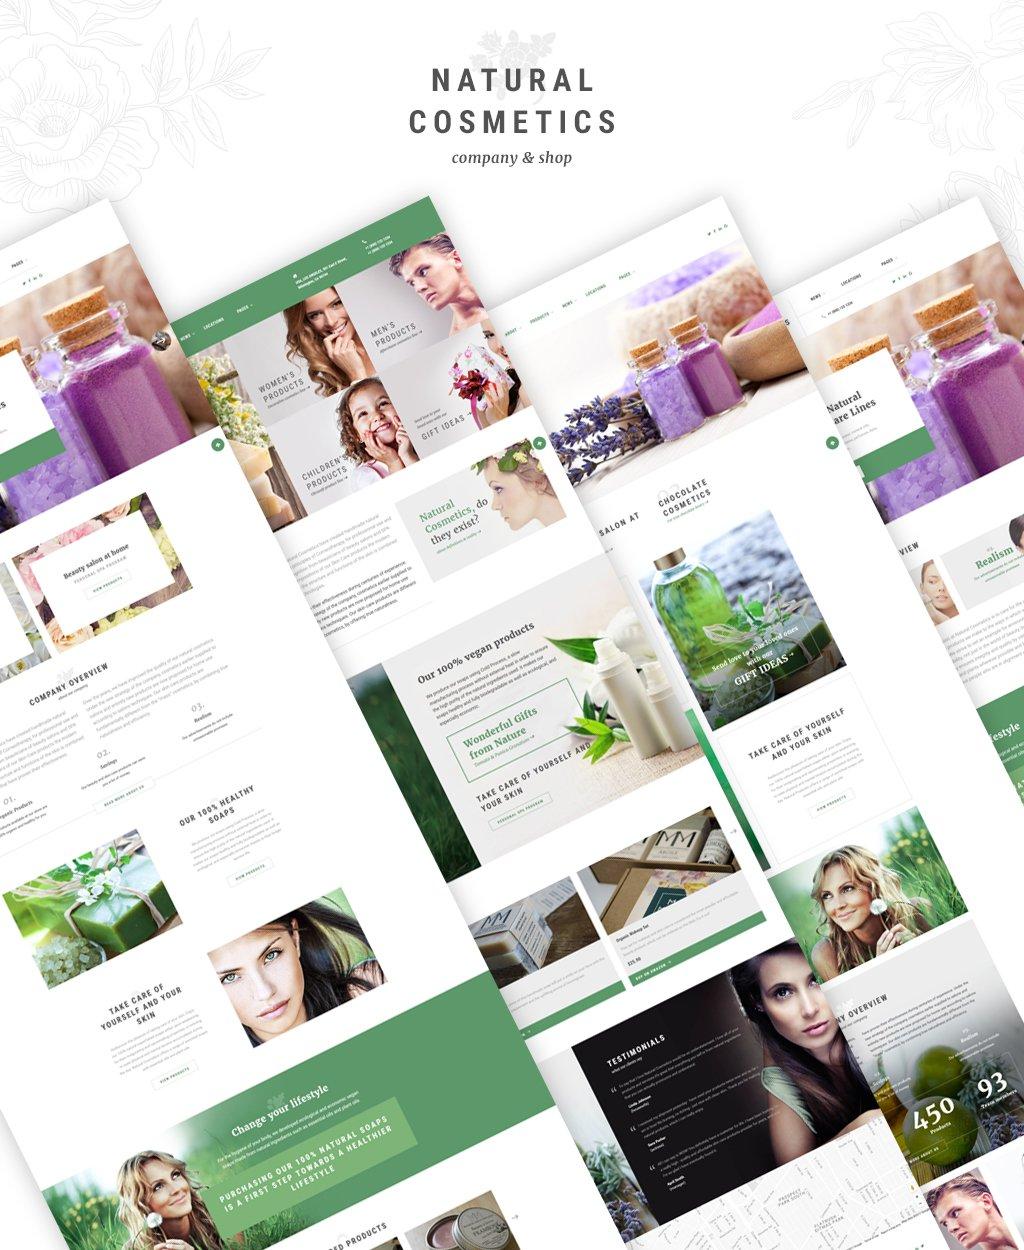 Natural Cosmetics - Cosmetics Store Multipage Website Template - screenshot